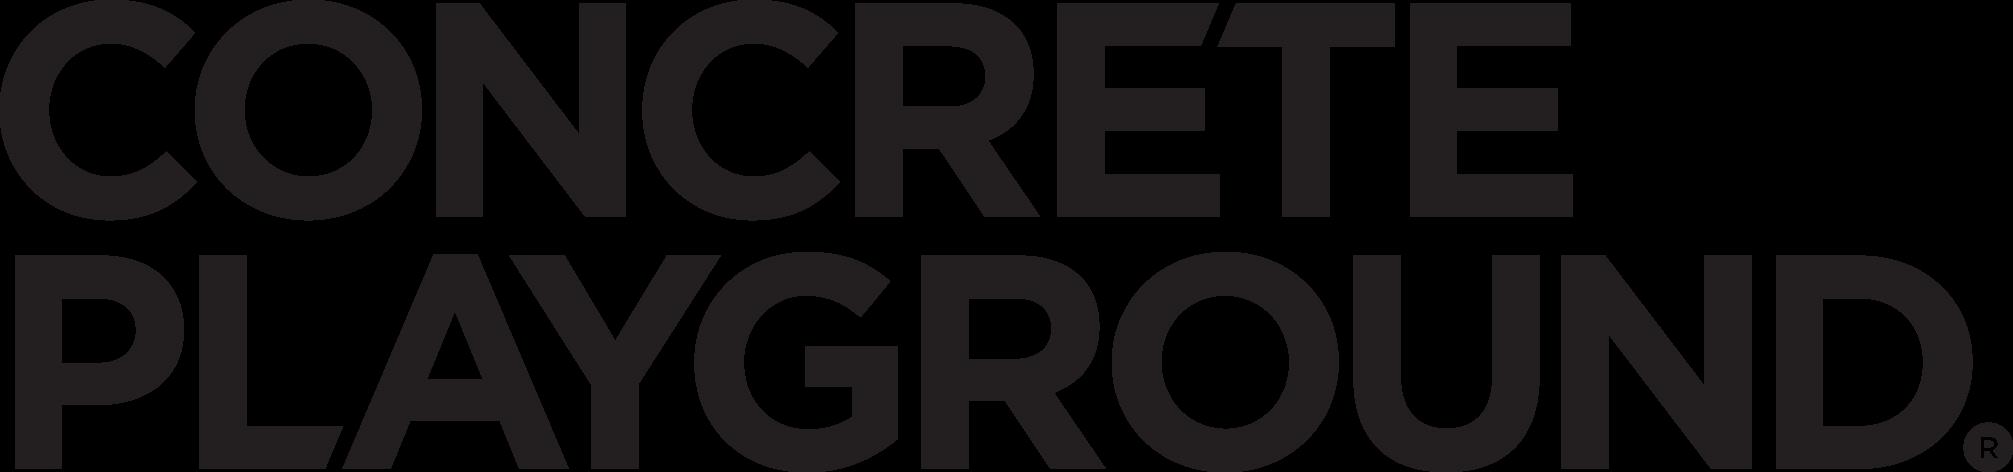 Concrete-Playground-Logo.png